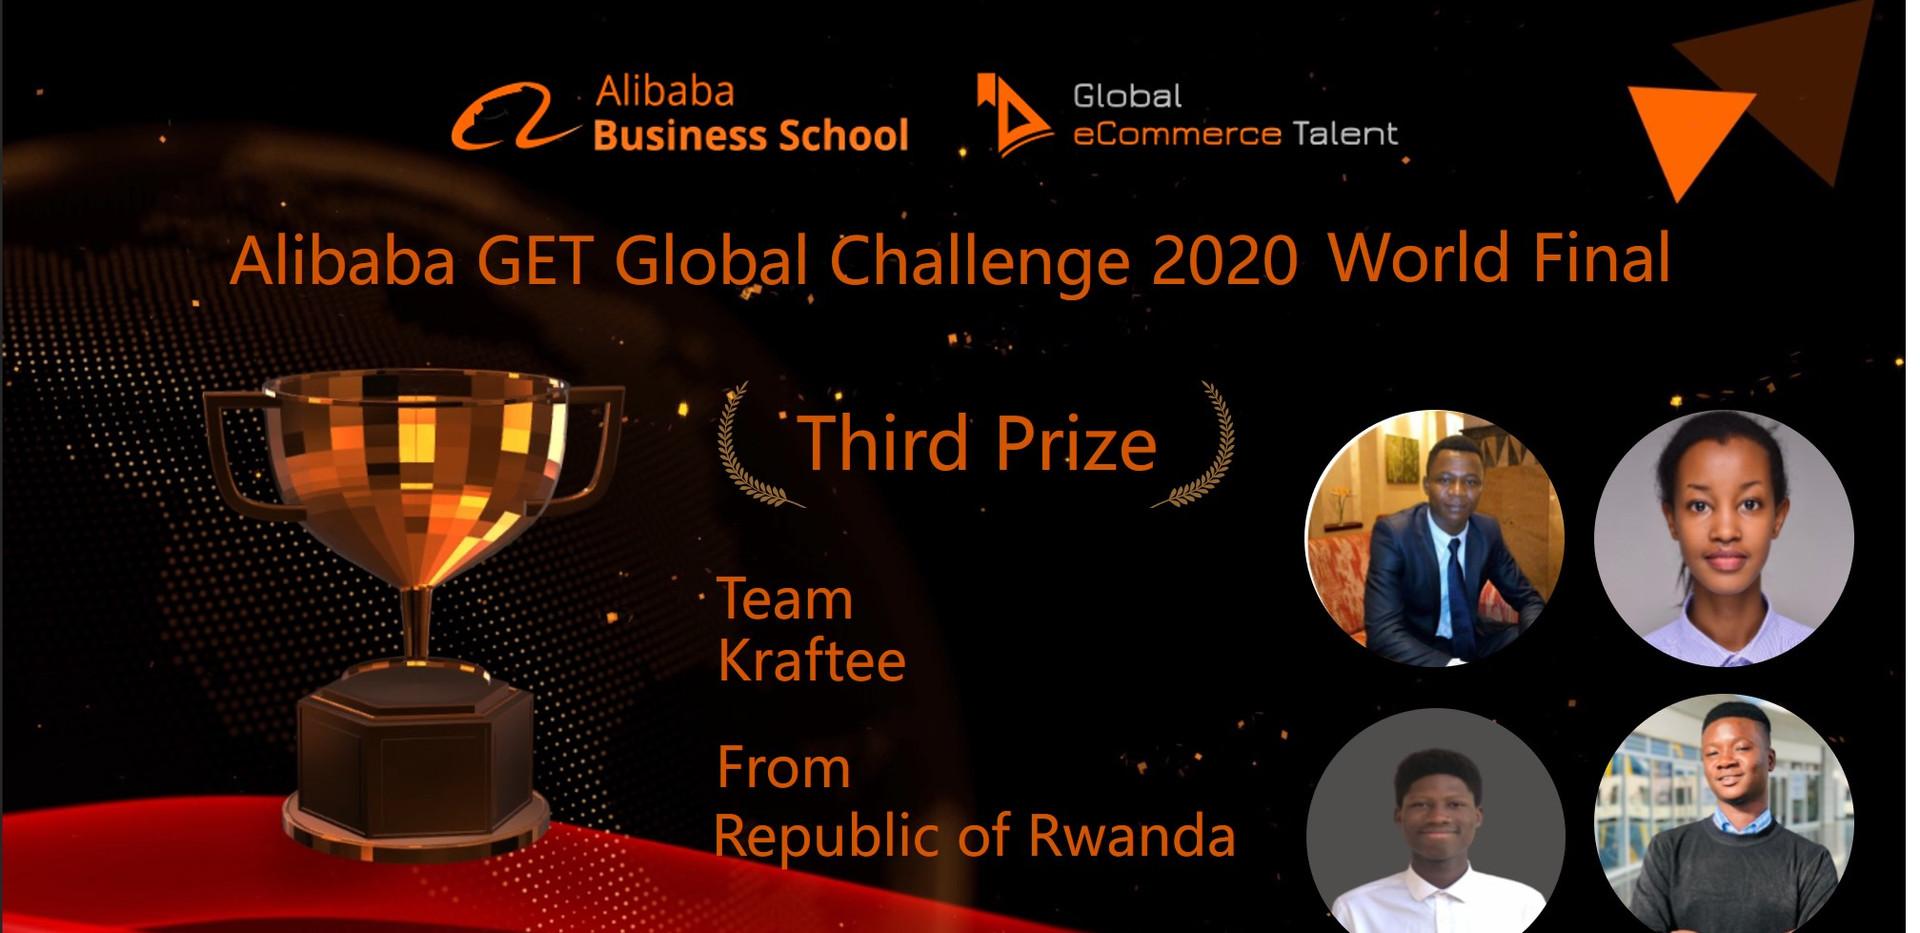 Third Prize - Republic of Rwanda